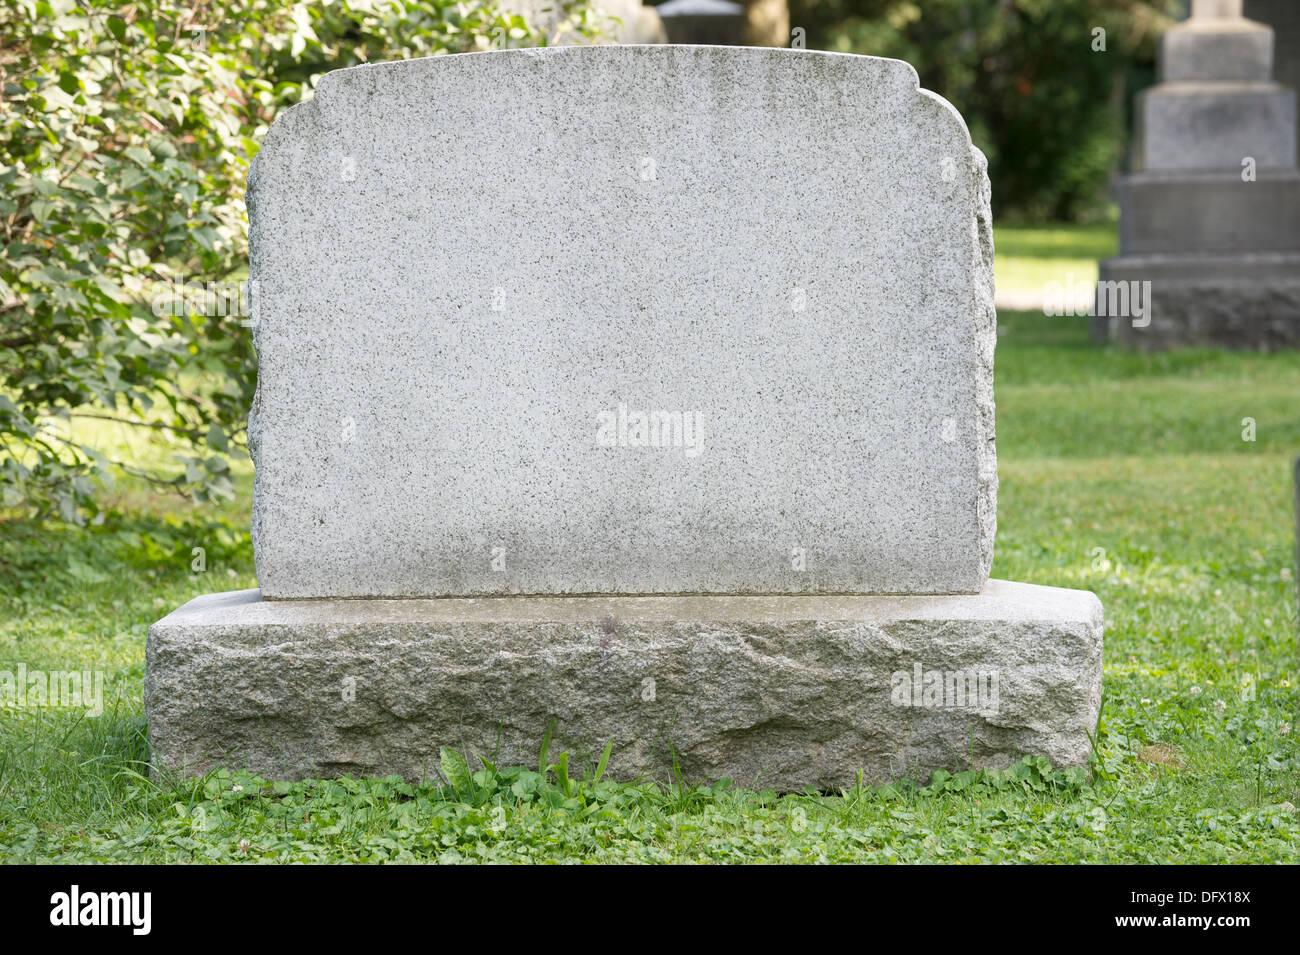 Blank headstone in cemetery Stock Photo: 61422730 - Alamy